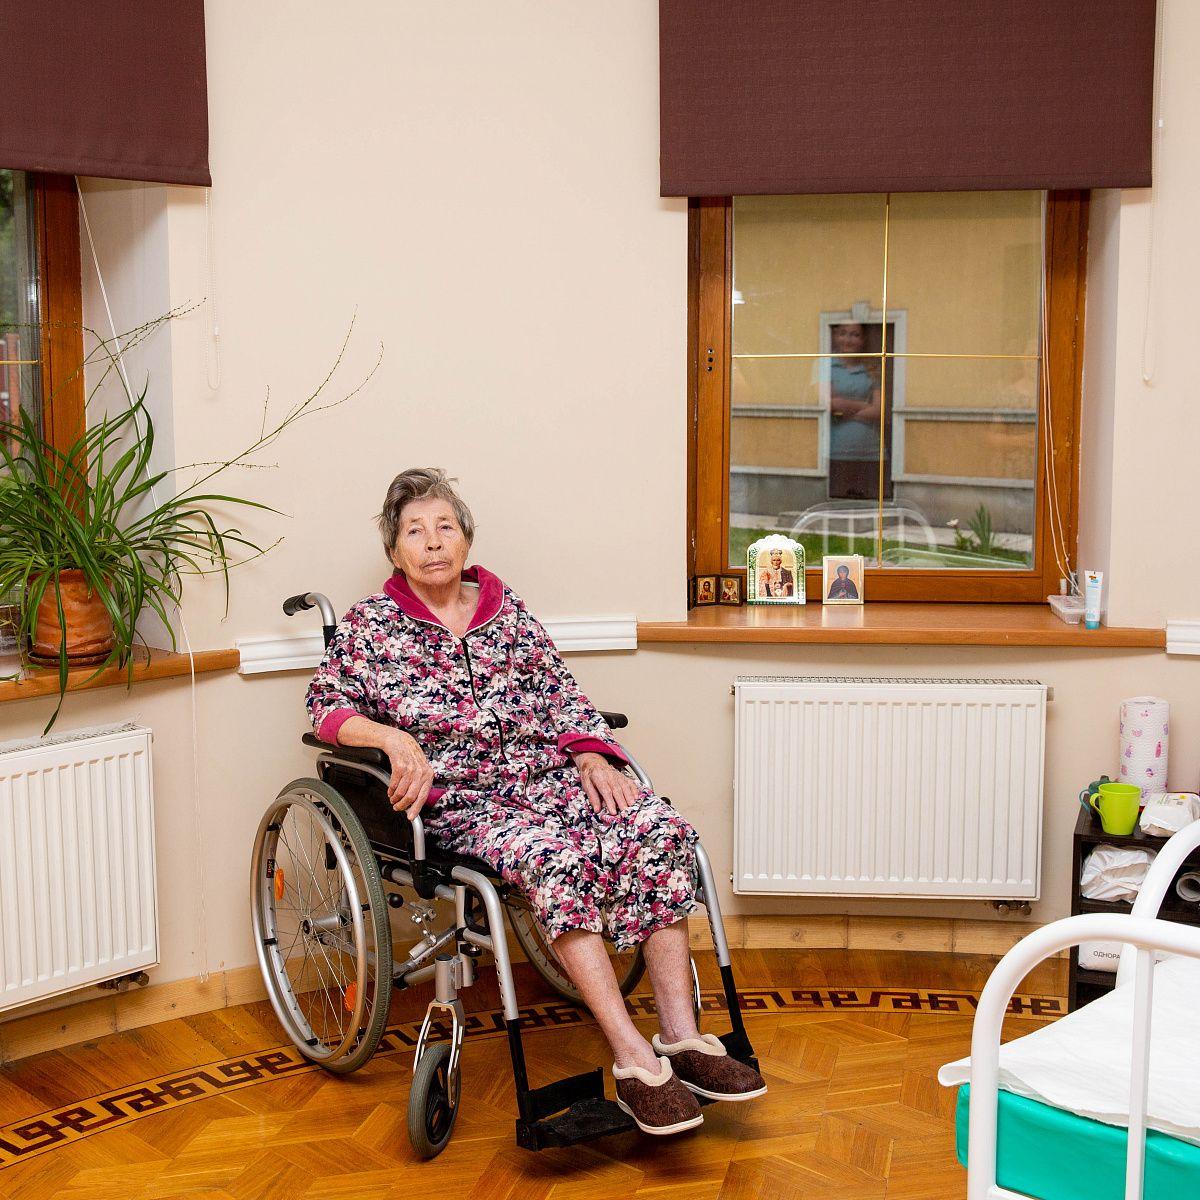 картинки пансионат для престарелых номер один, гурченко